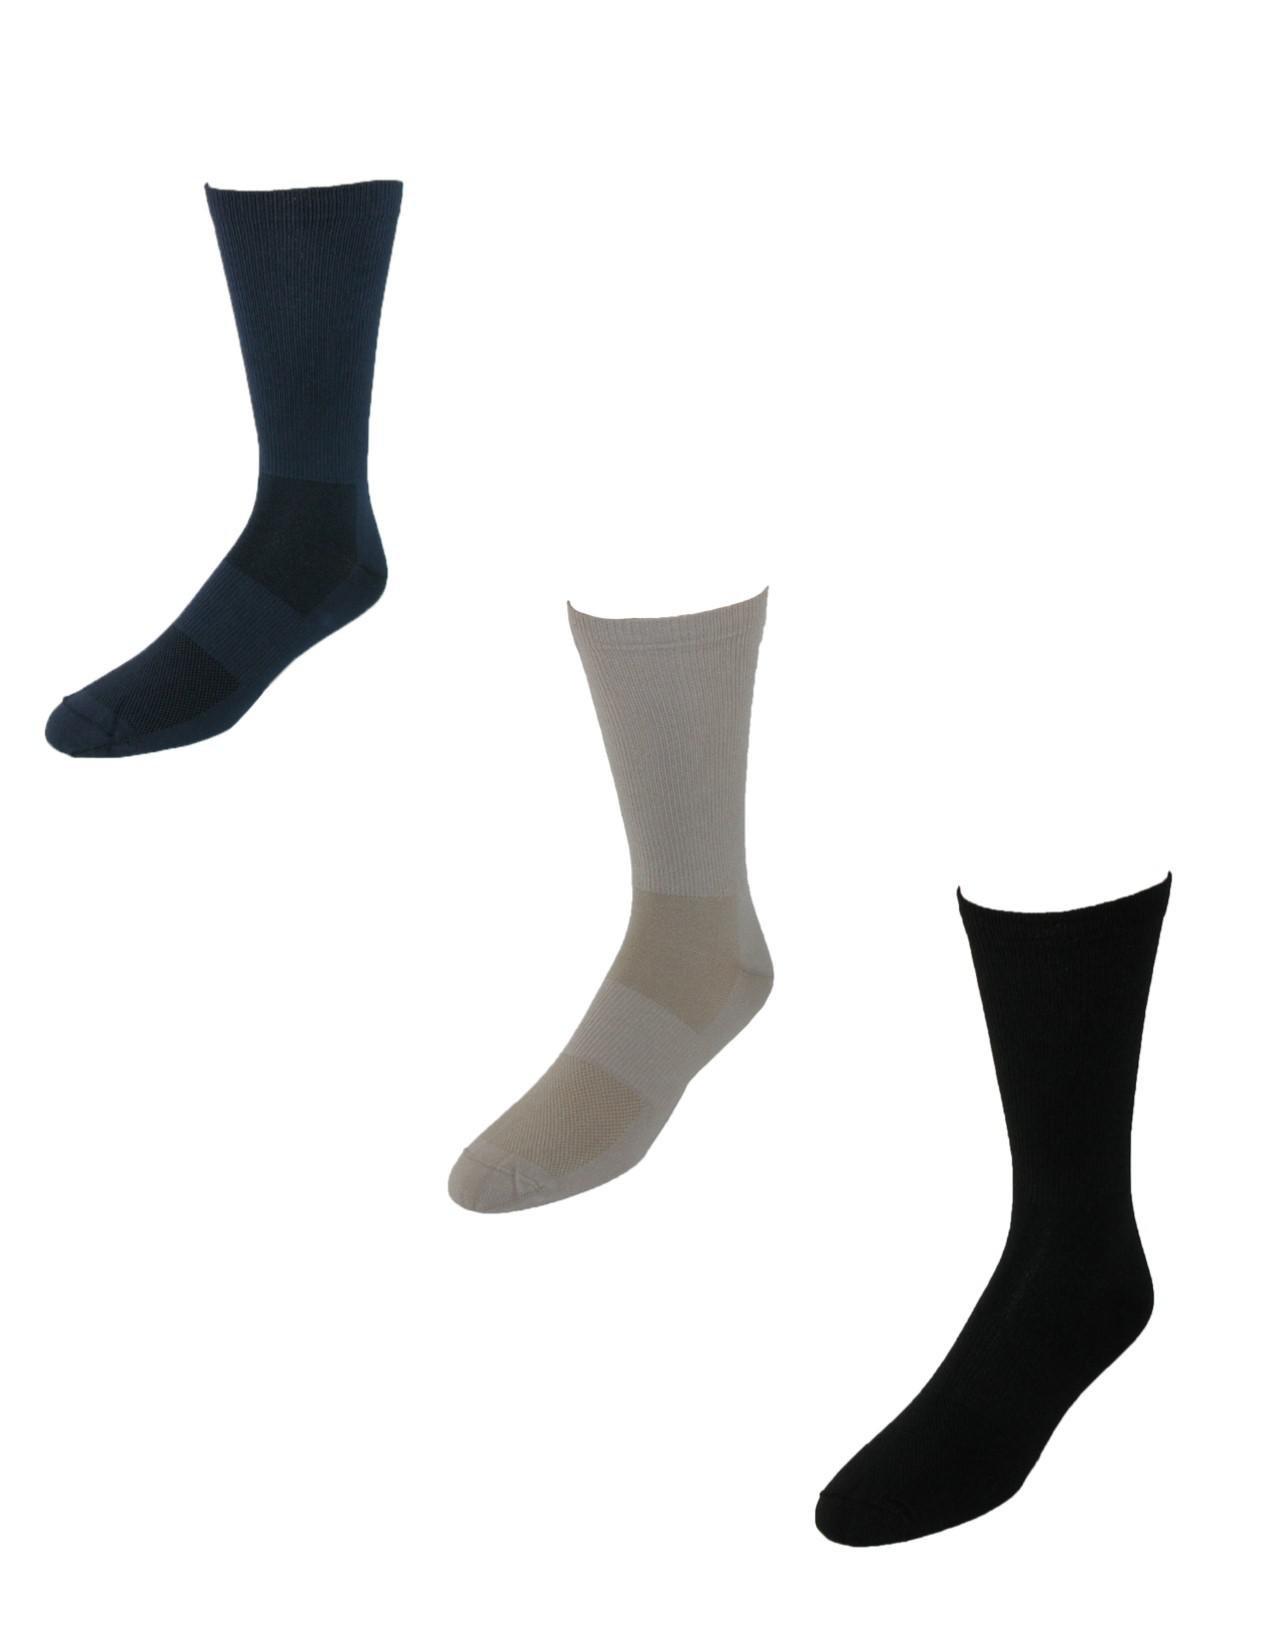 Tilley TA800 Dries Overnight Travel Socks (Pack of 3), Large, Black/Khaki/Navy